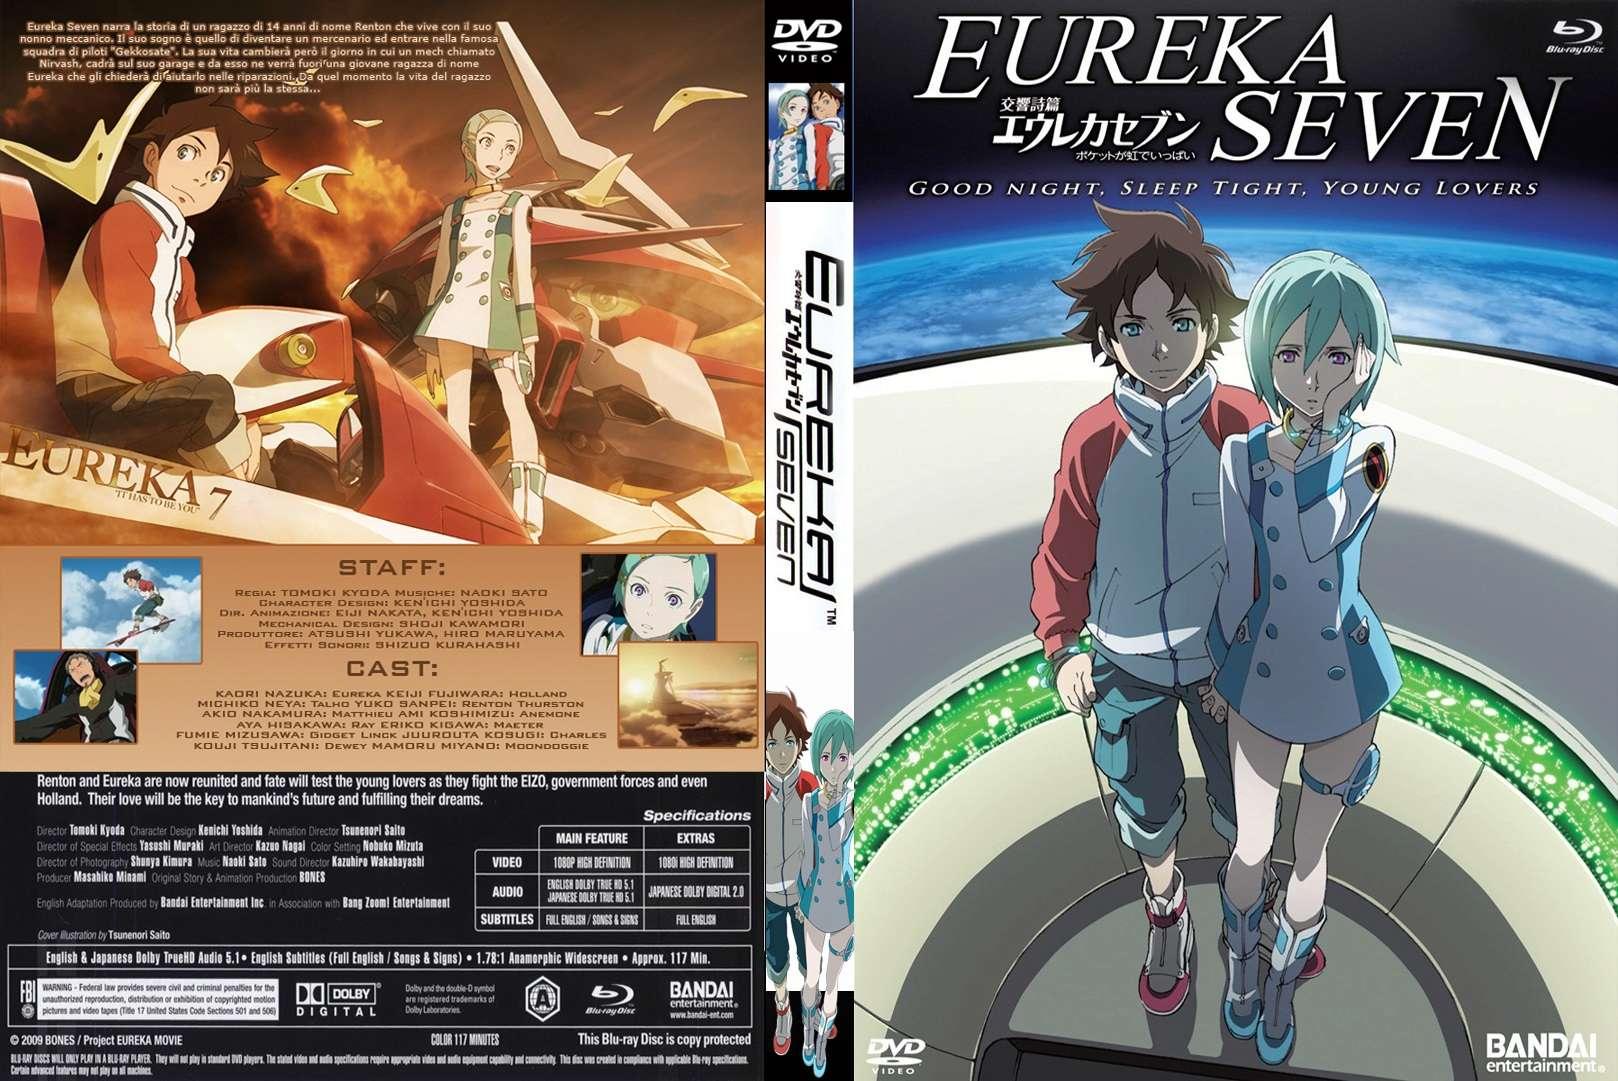 Caratula-COVER | Eureka Seven en DVD COMPLETA Eureka10